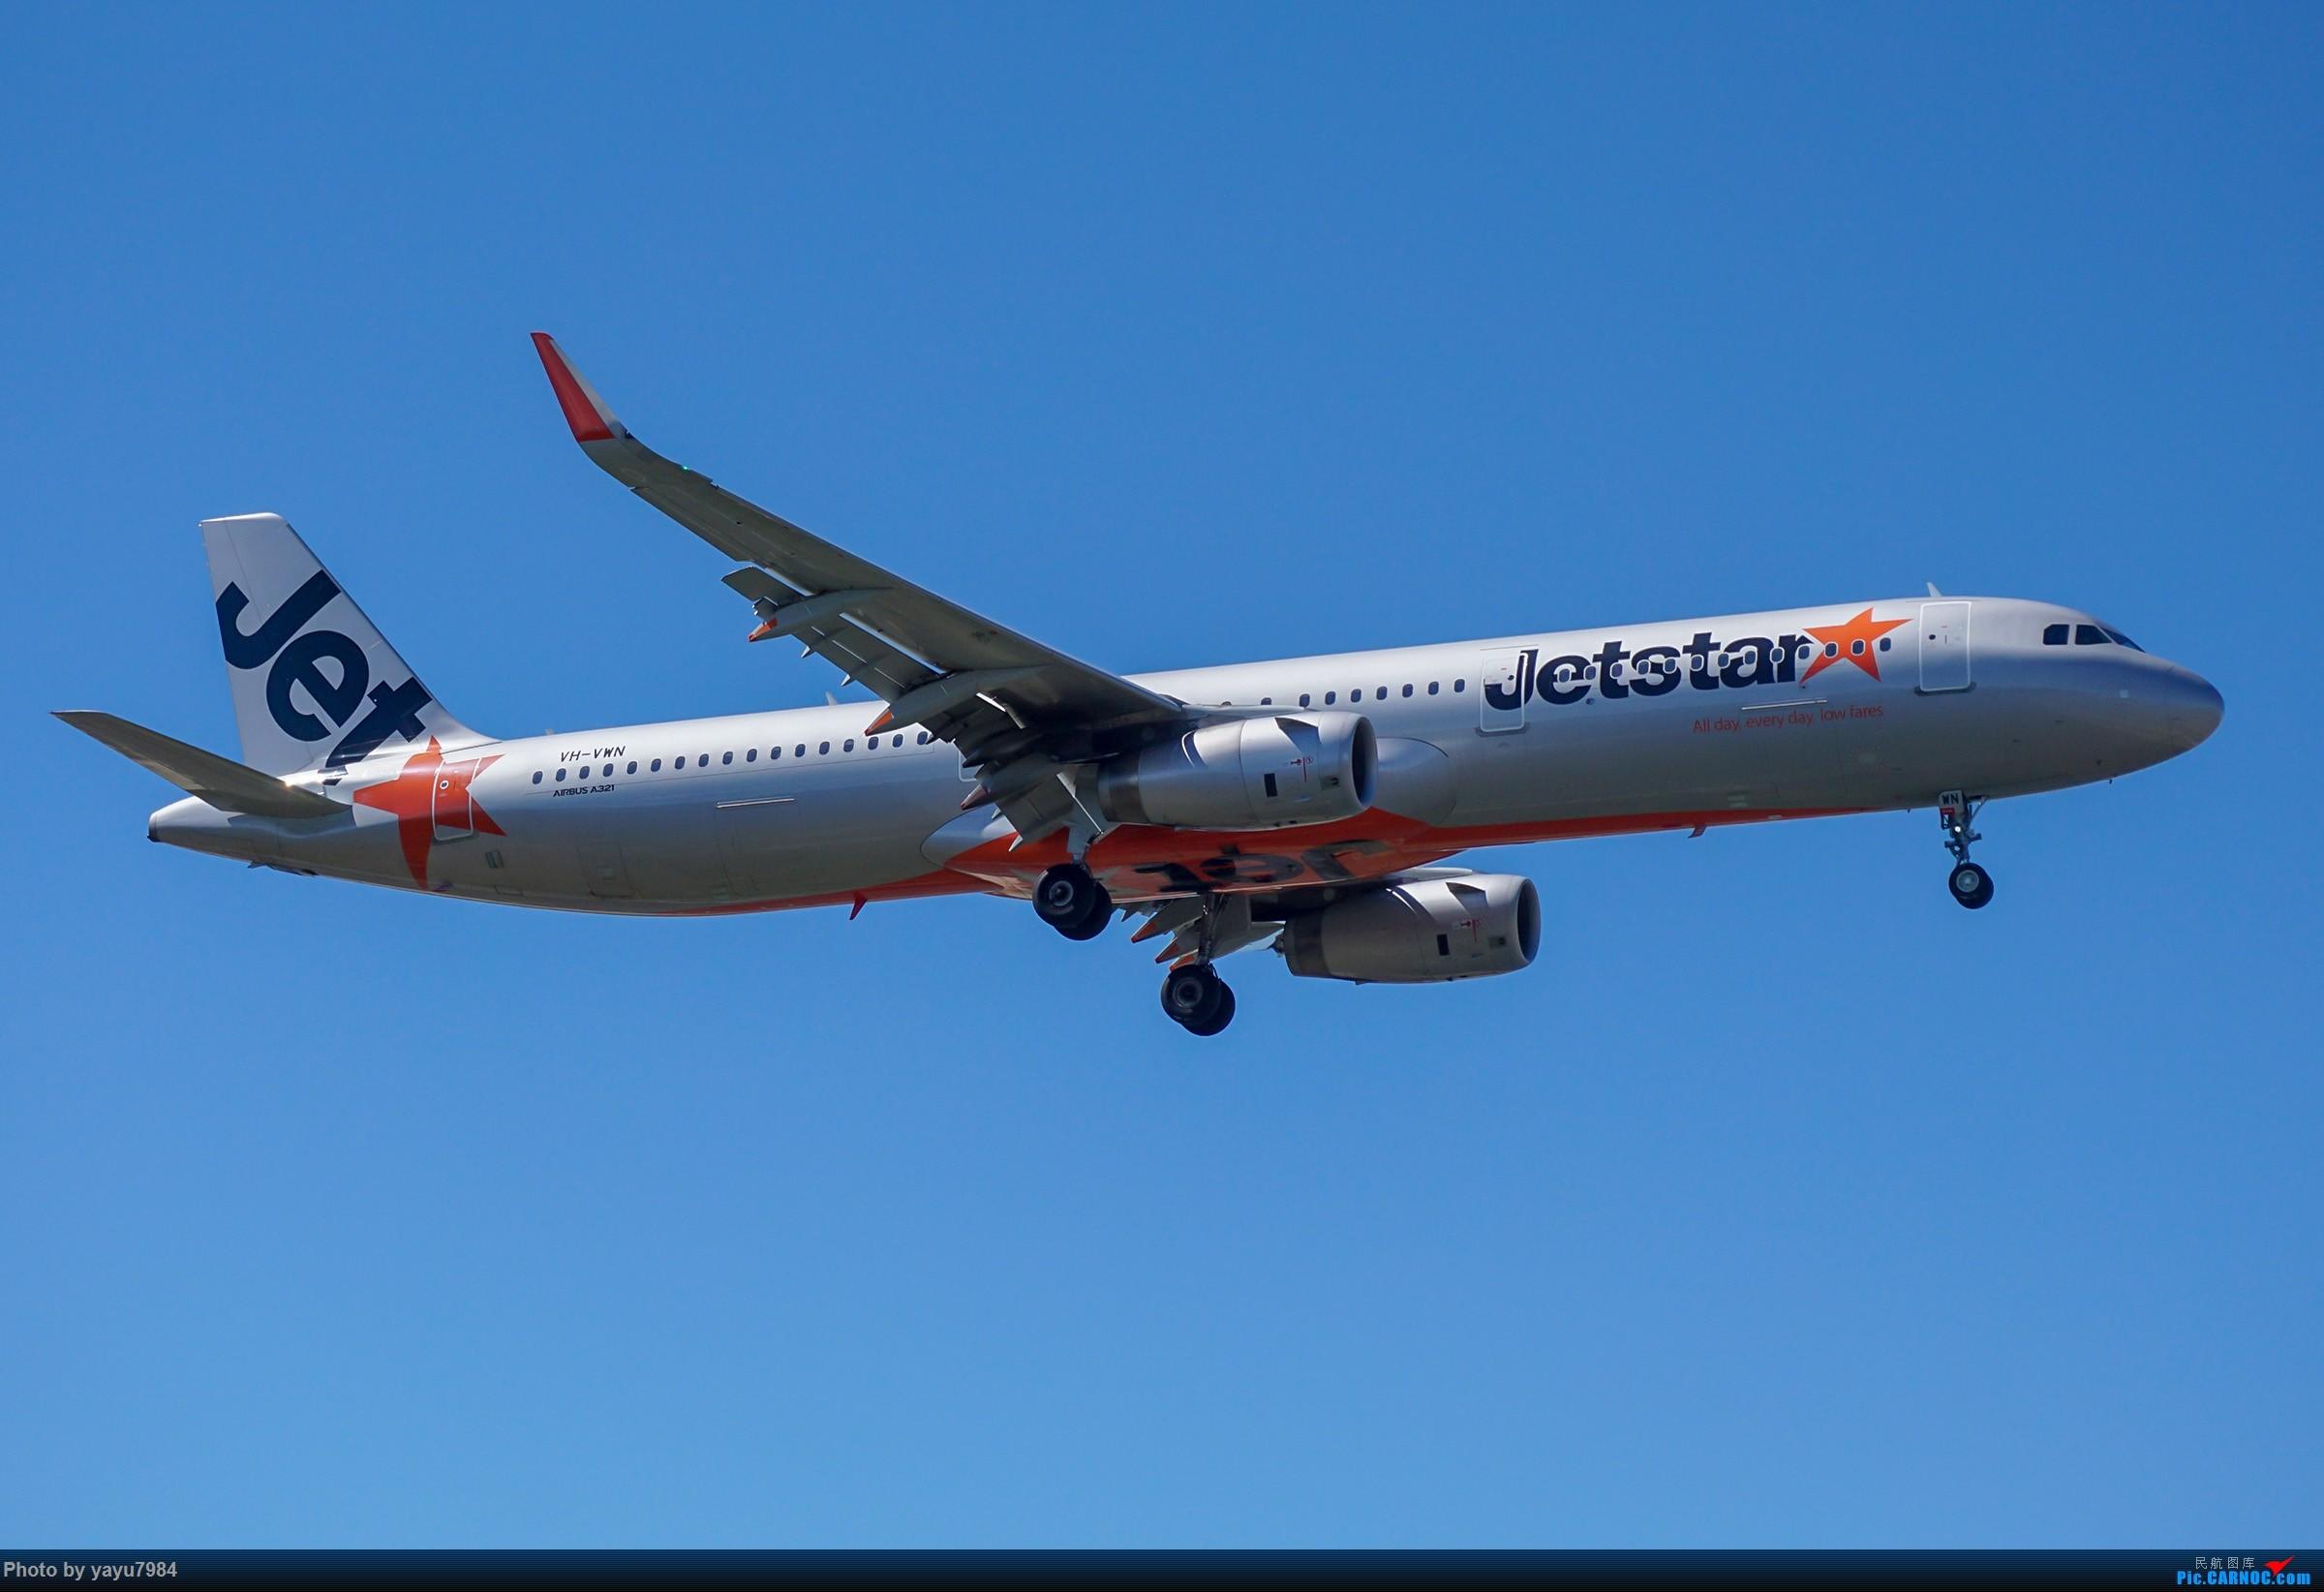 Re:[原创][SYD] 东航天合332,雪绒花343,华航蓝鹊,以及其他日常货 AIRBUS A321-200 VH-VWN 澳大利亚悉尼金斯福德·史密斯机场